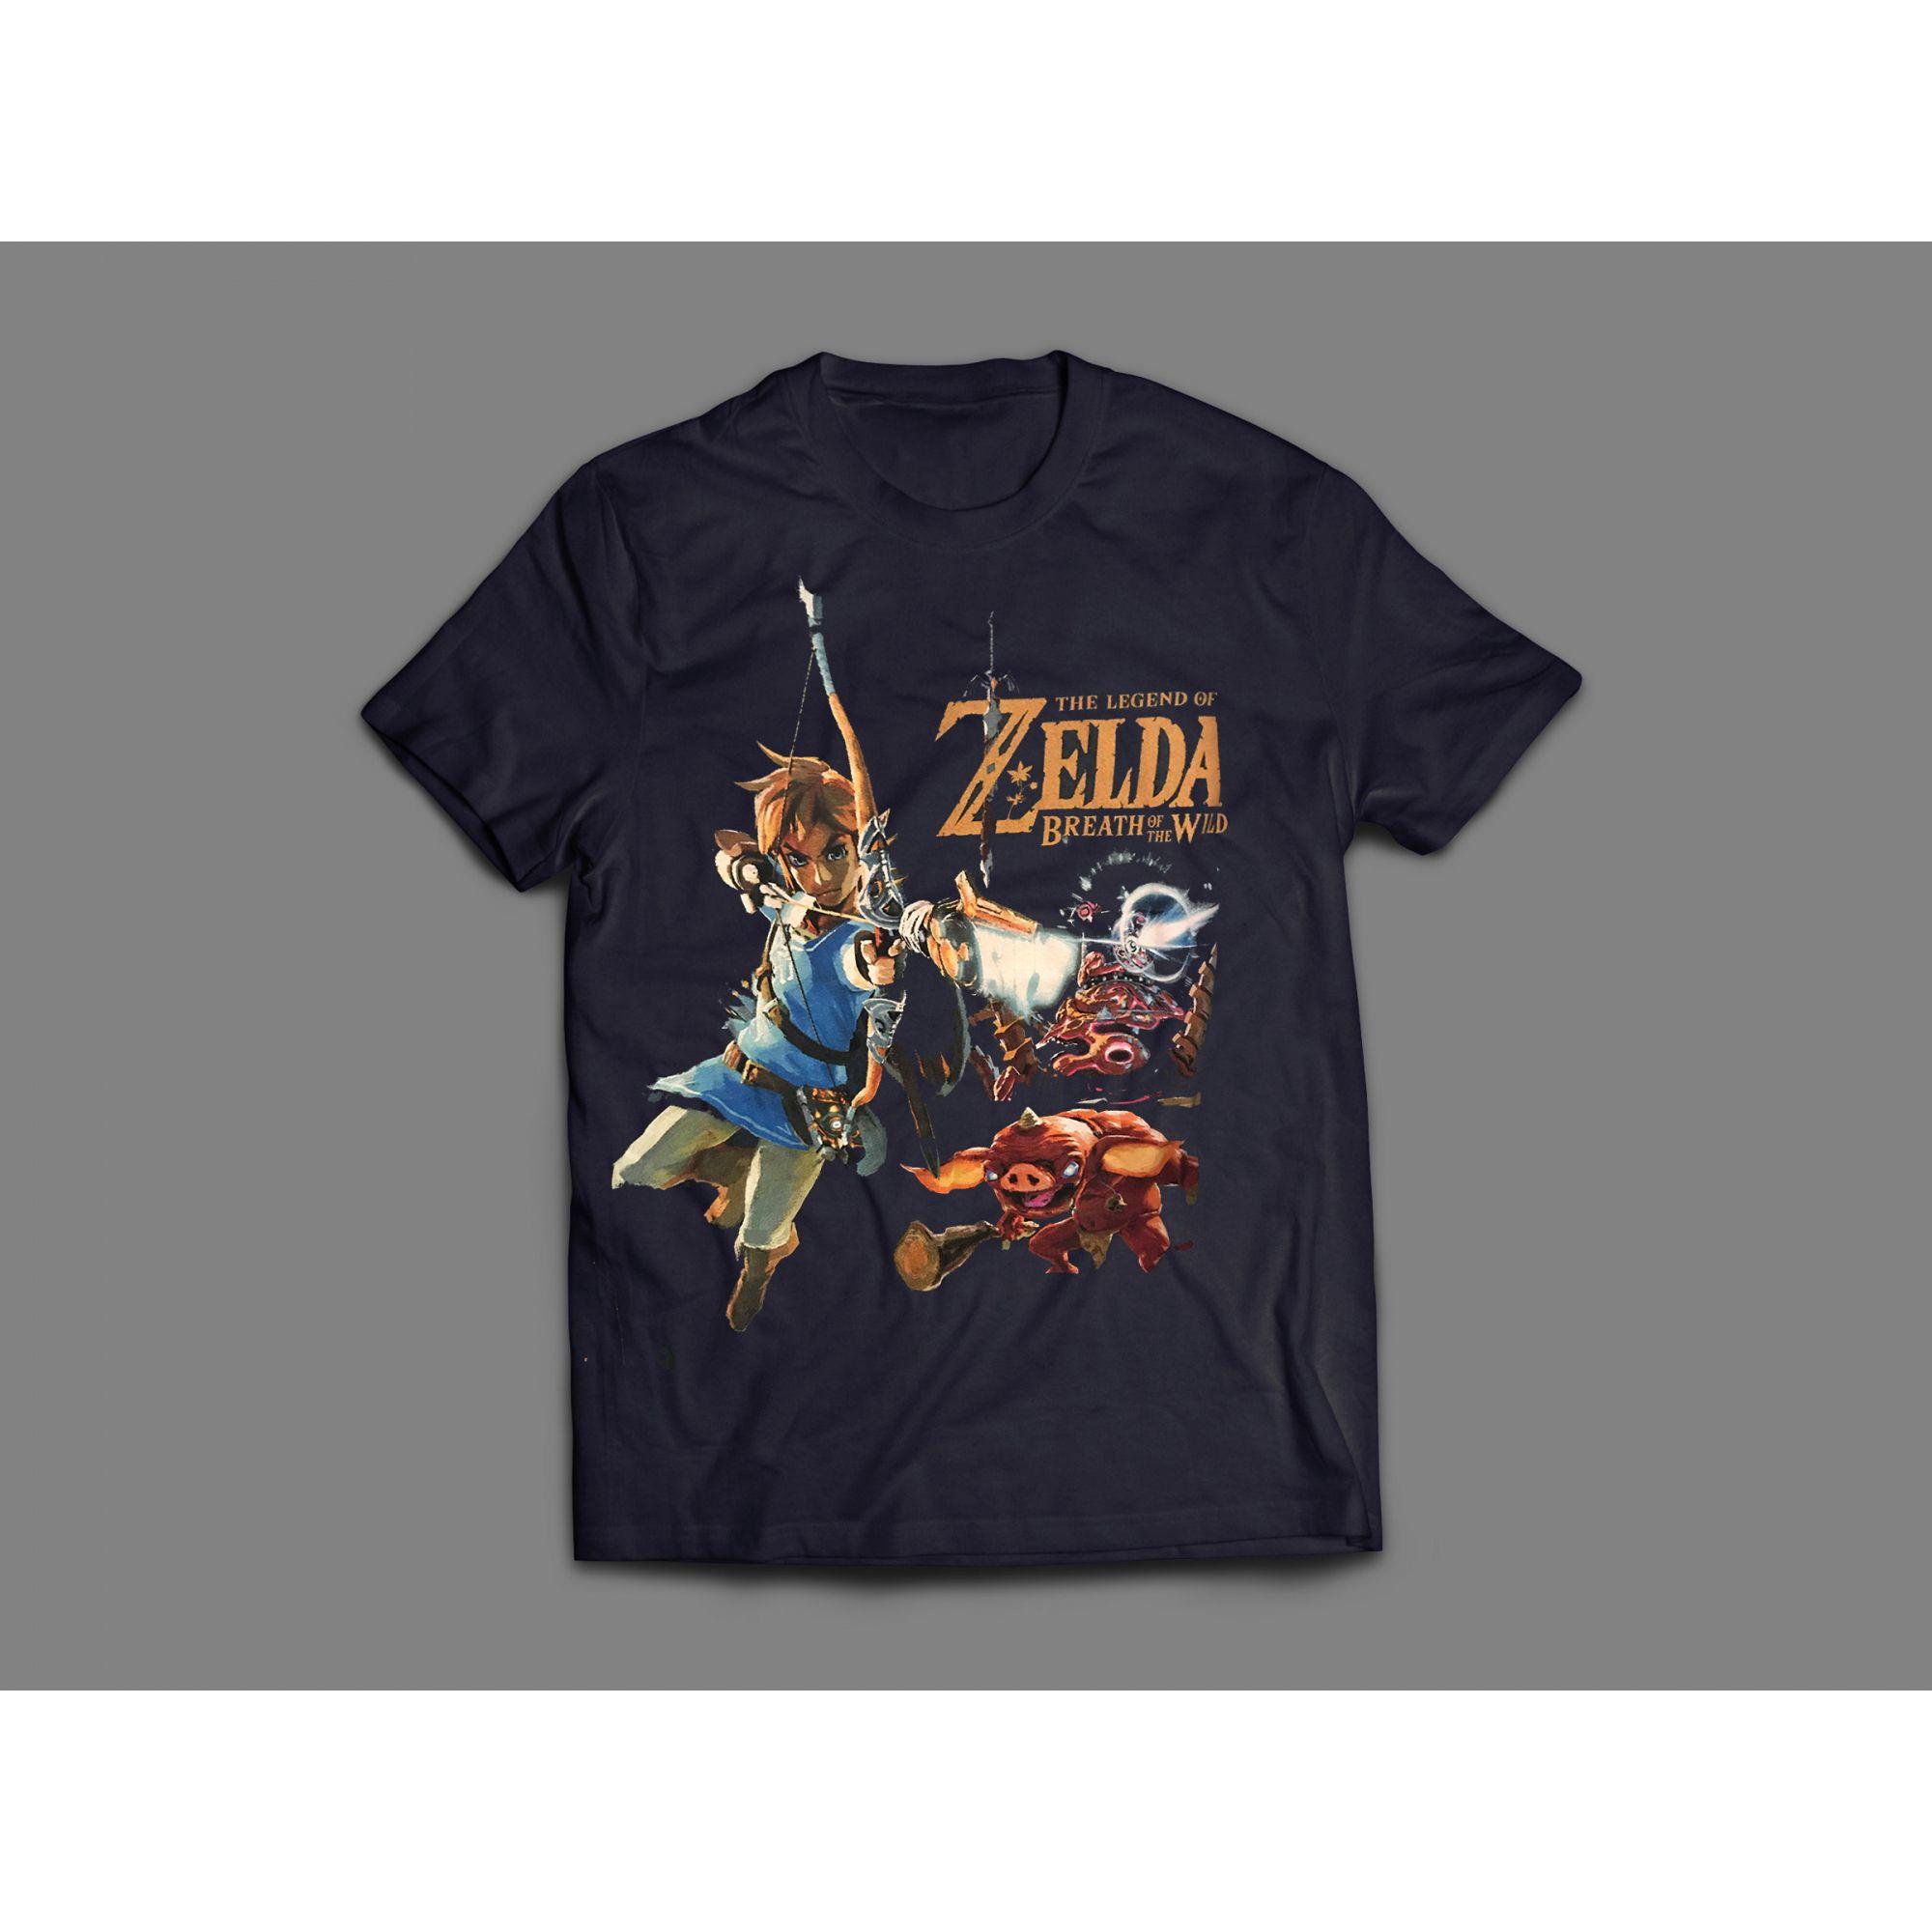 Camiseta Bokoblin Zelda Azul Marinho Oficial Nintendo